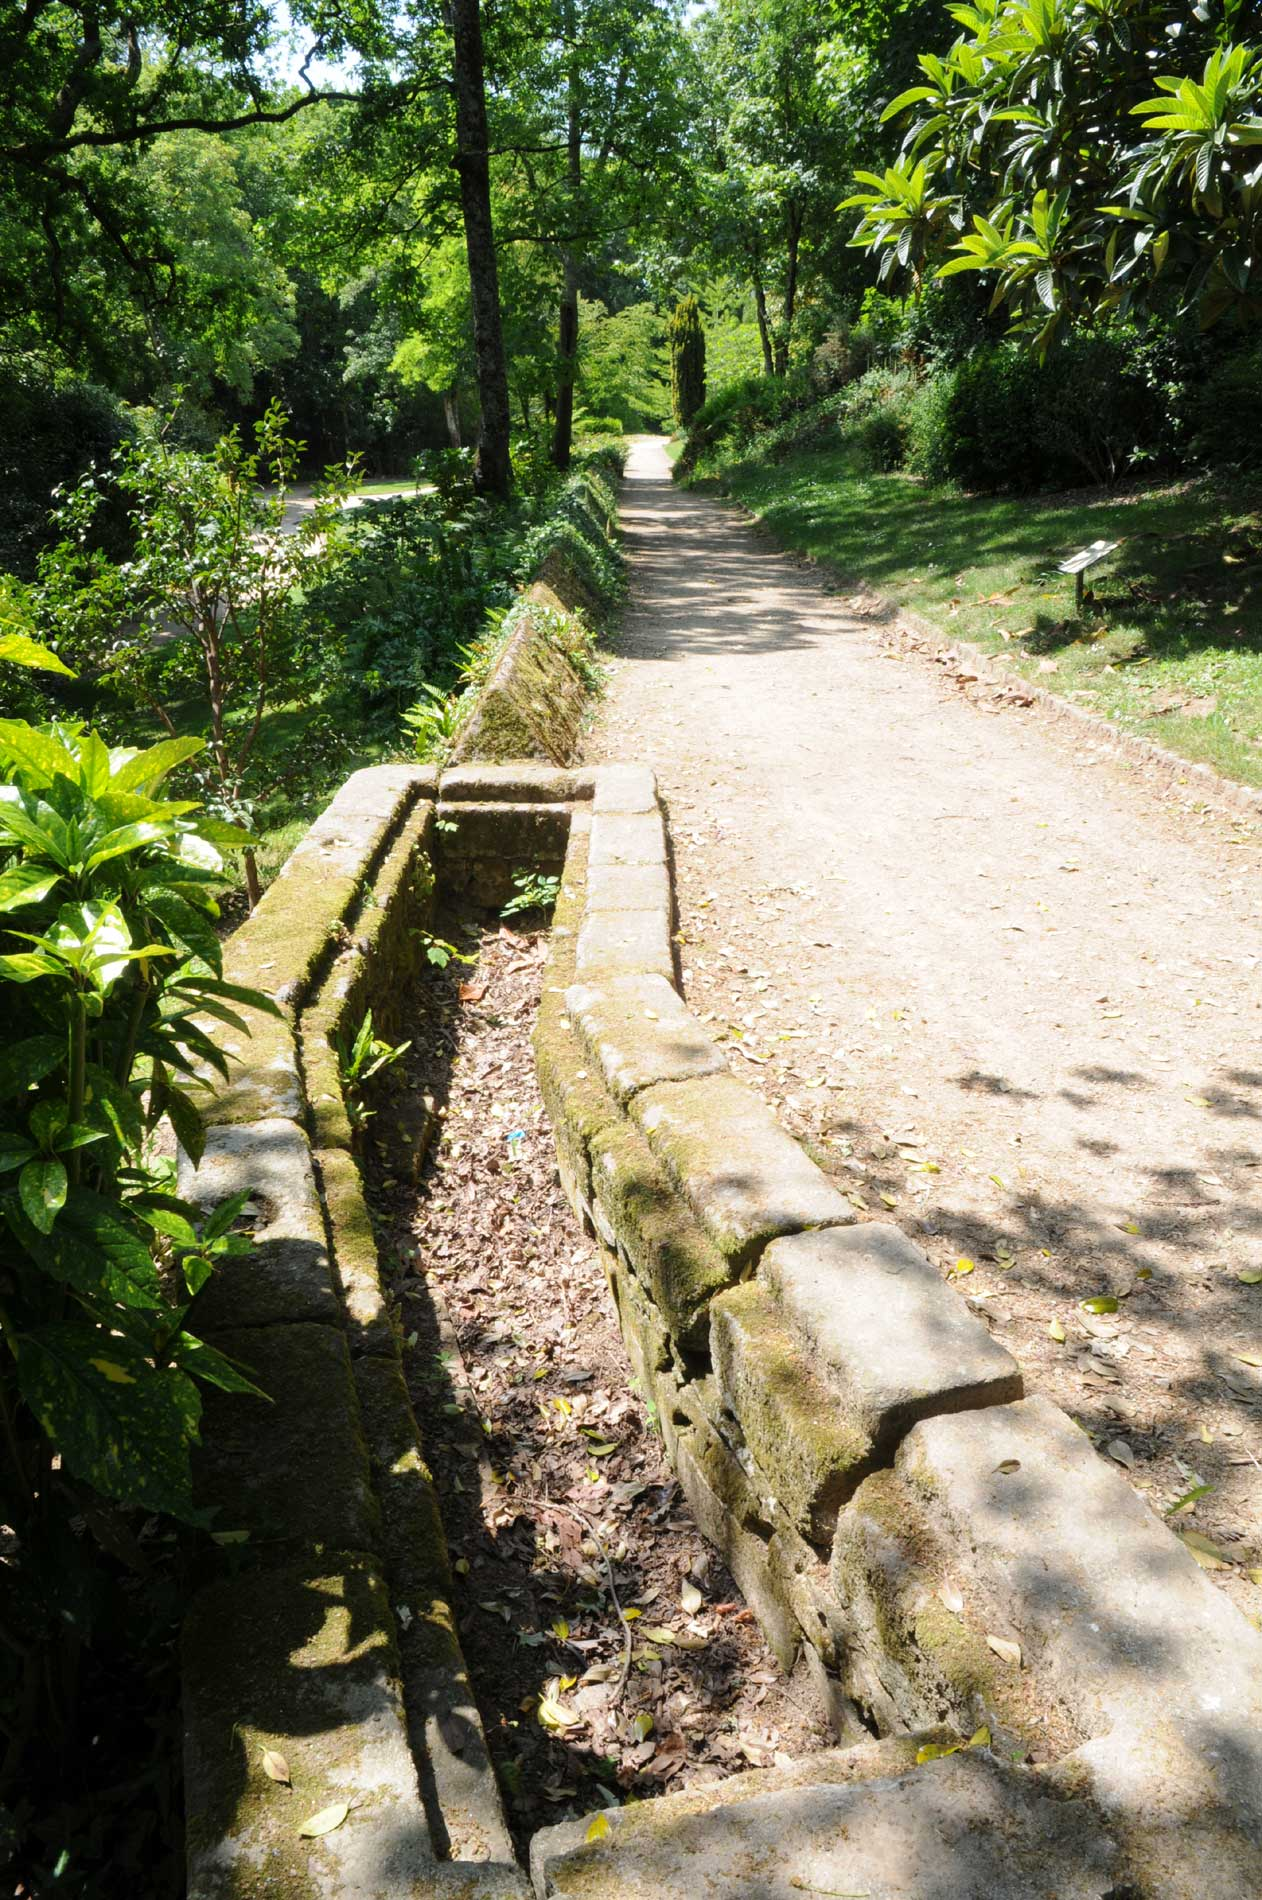 Canalisation de la Compagnie des Indes dans le jardin Chevassu